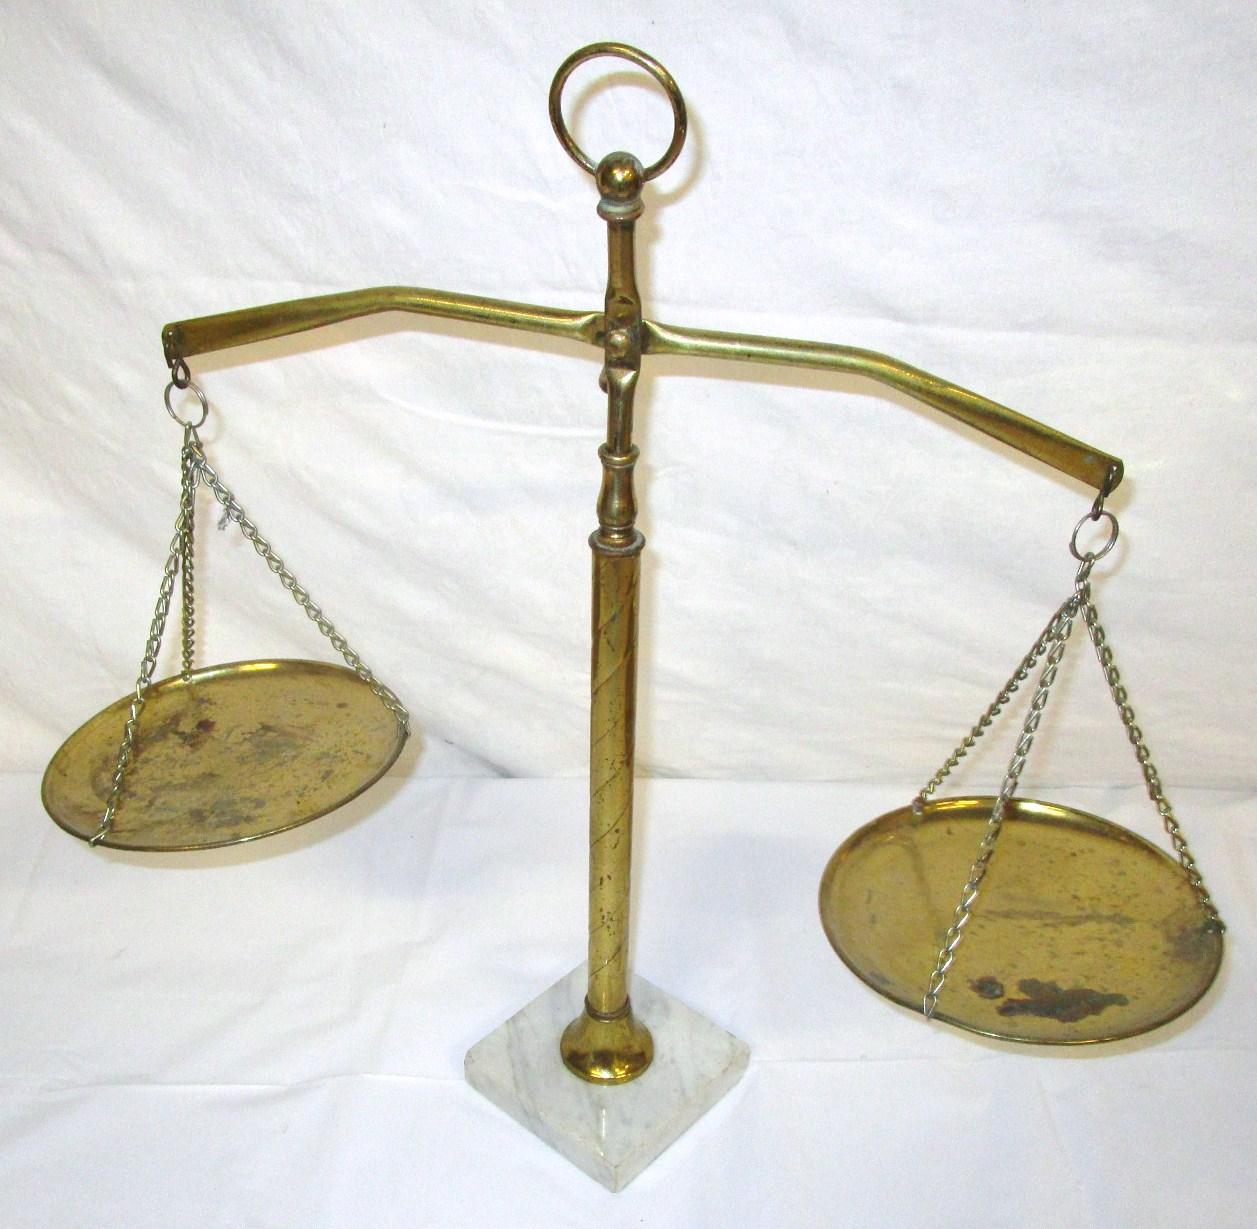 Scale balance 2